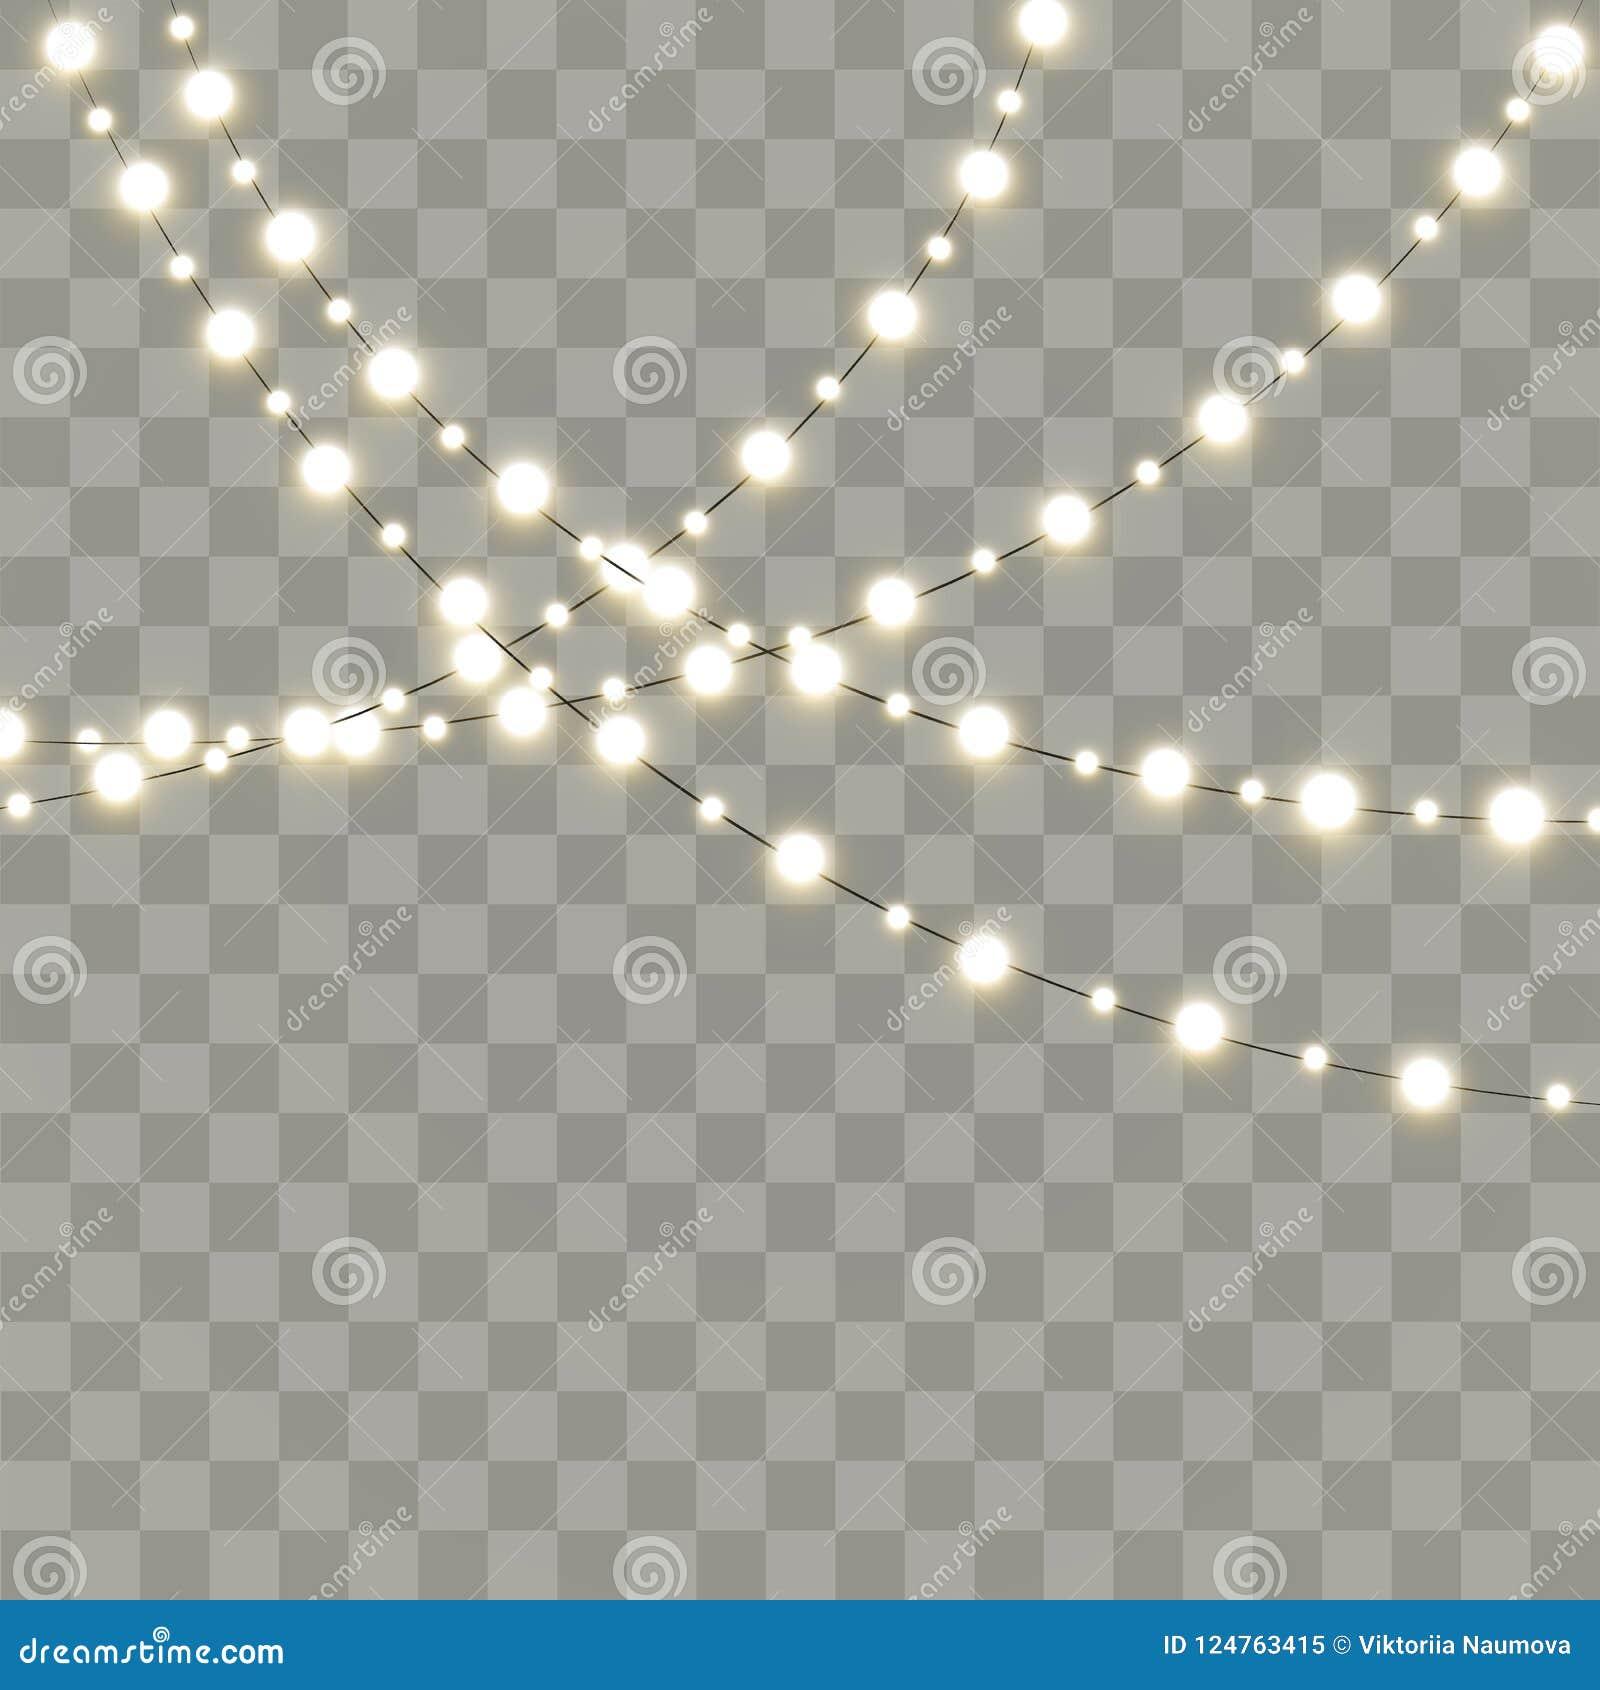 Light Flare Special Effect Illustration Vector Sparkles On